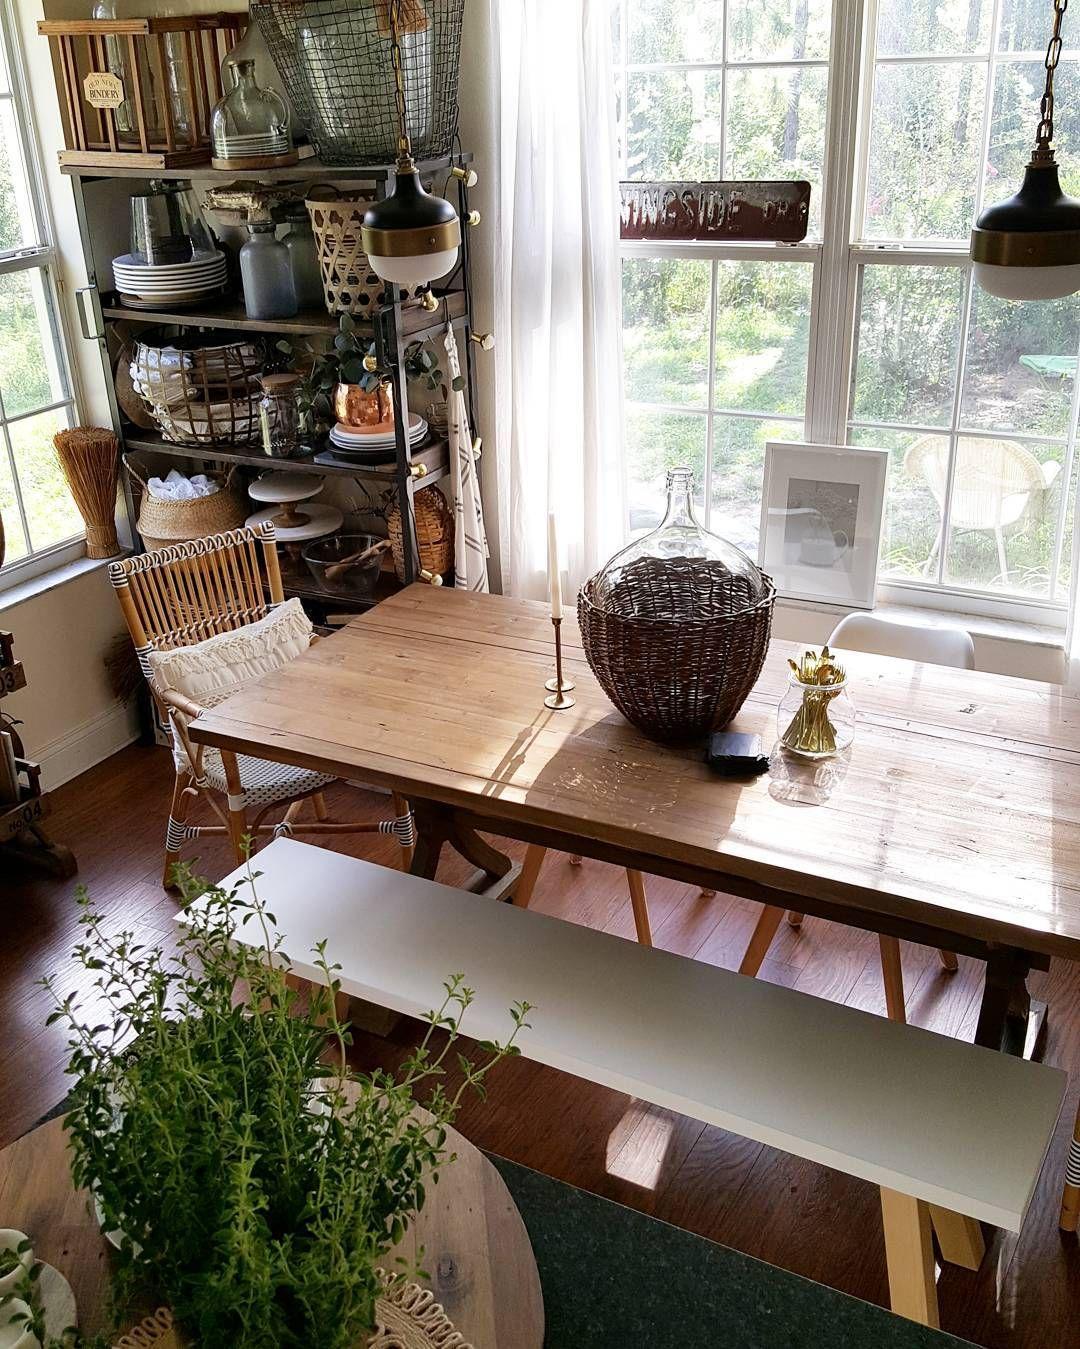 Modern Farmhouse White and Wood Scandinavian kitchen